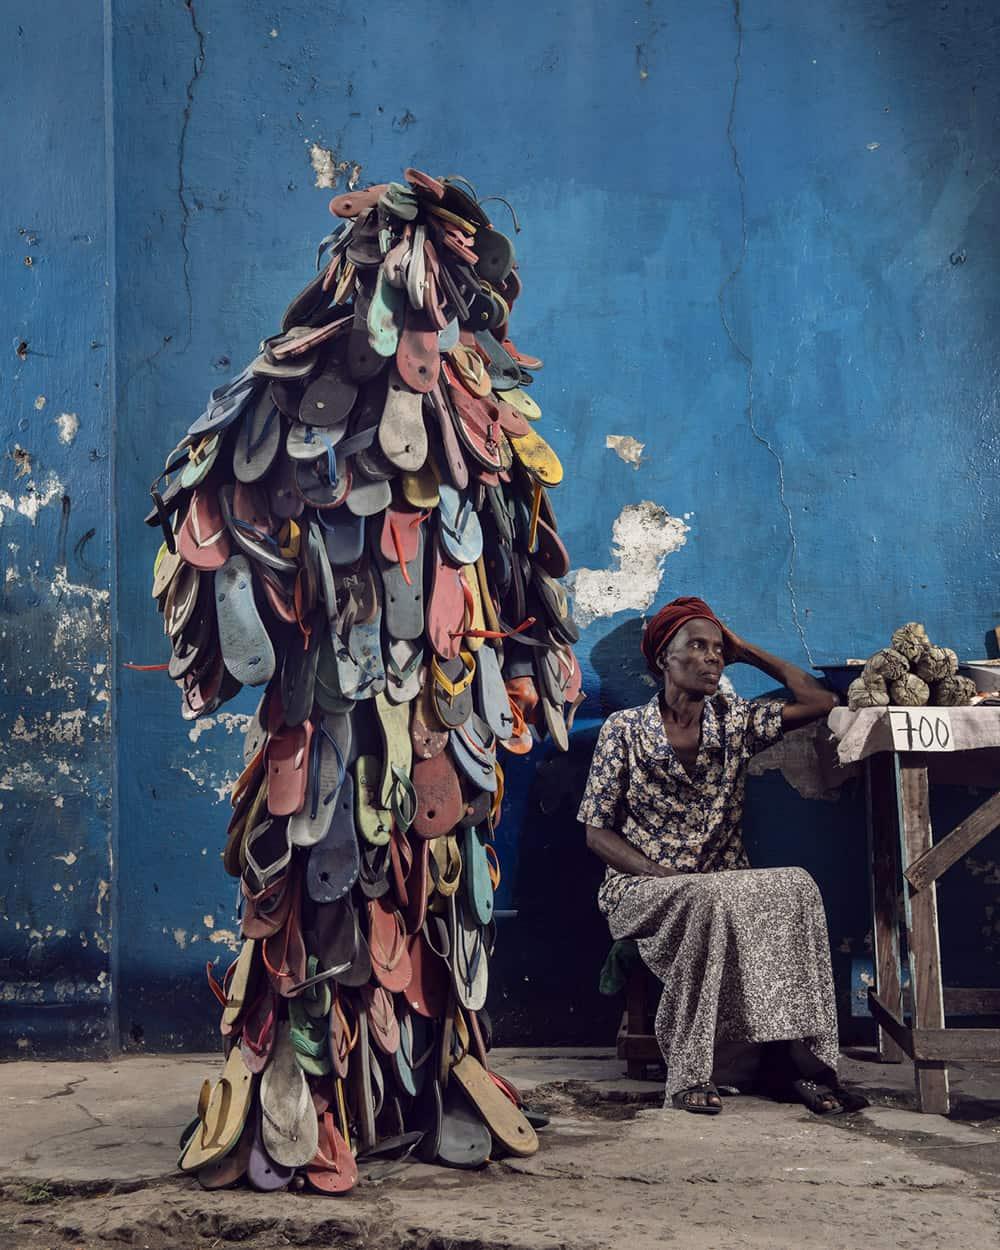 Untitled #21, 2020 Homo Detritus, Real Portraitik #5 Kinshasa, RDC ©Stephan Gladieu